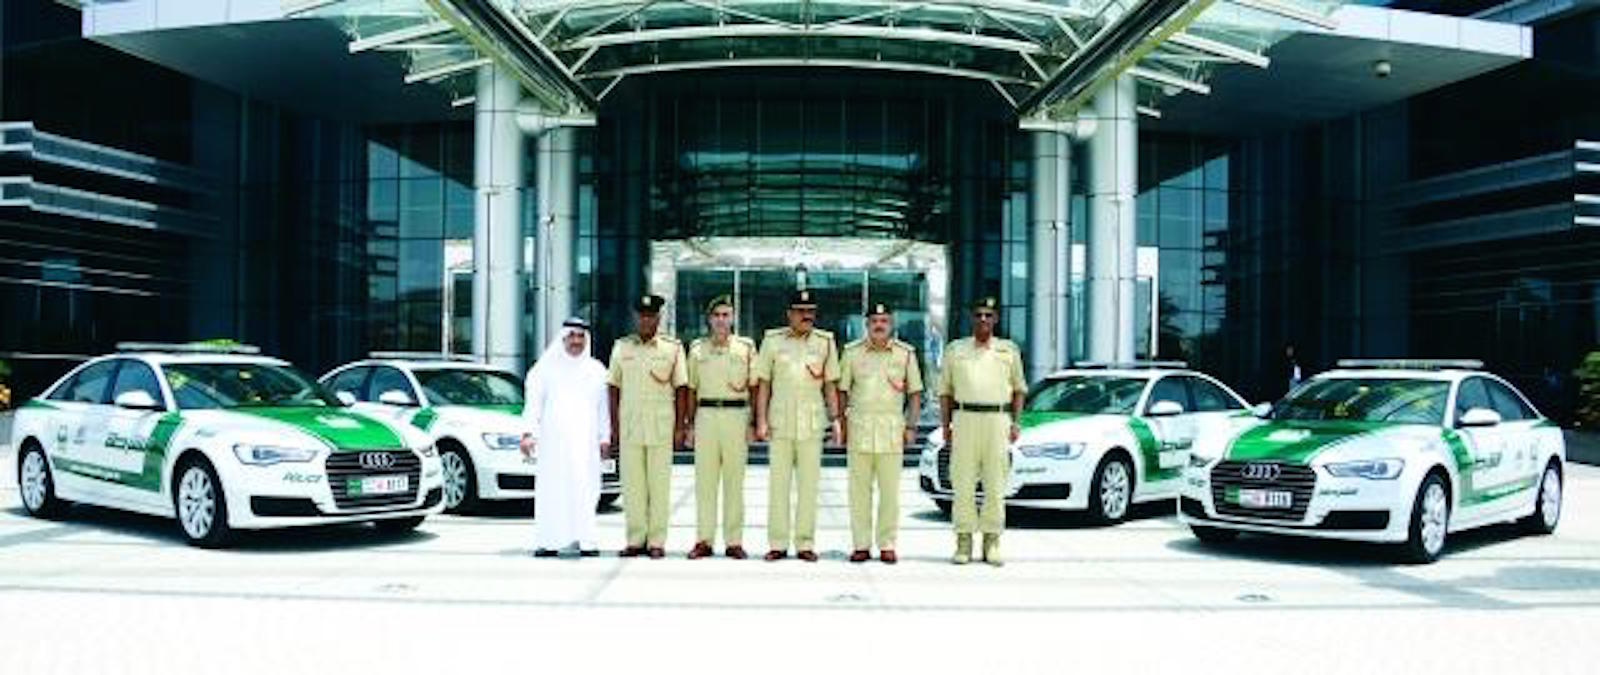 Полицейские Audi A6 в Дубае